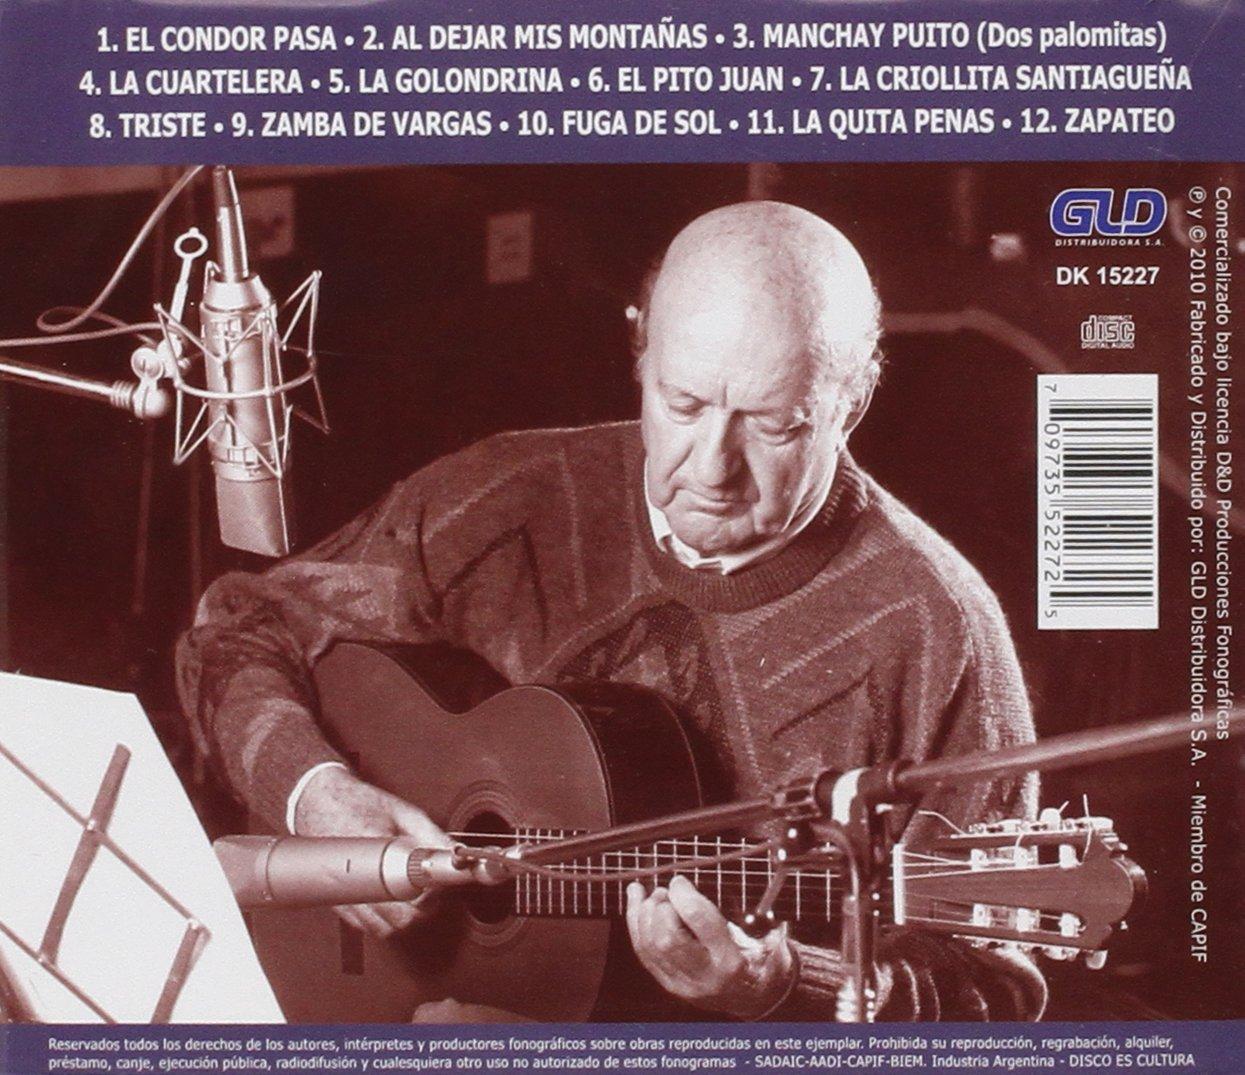 Solos de Guitarra: Eduardo Falu: Amazon.es: Música